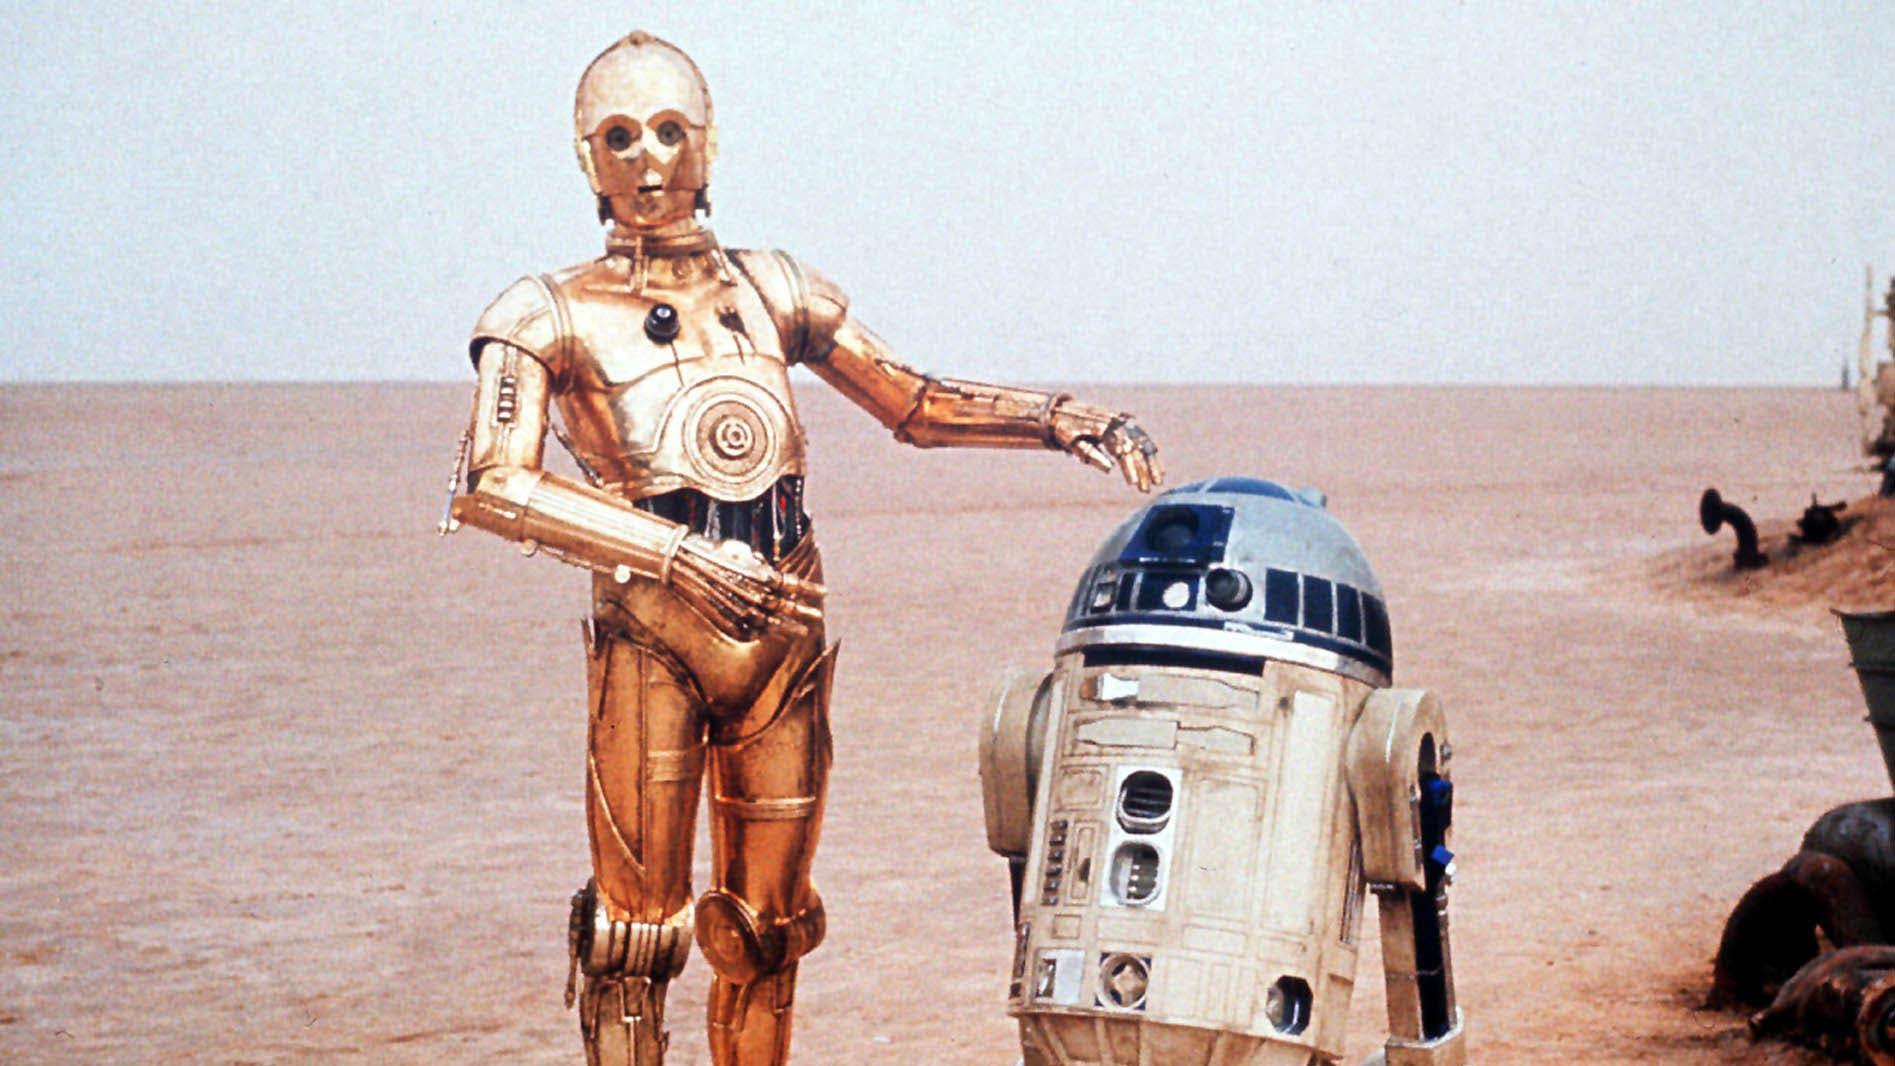 Star Wars music maestro John Williams named most popular living composer